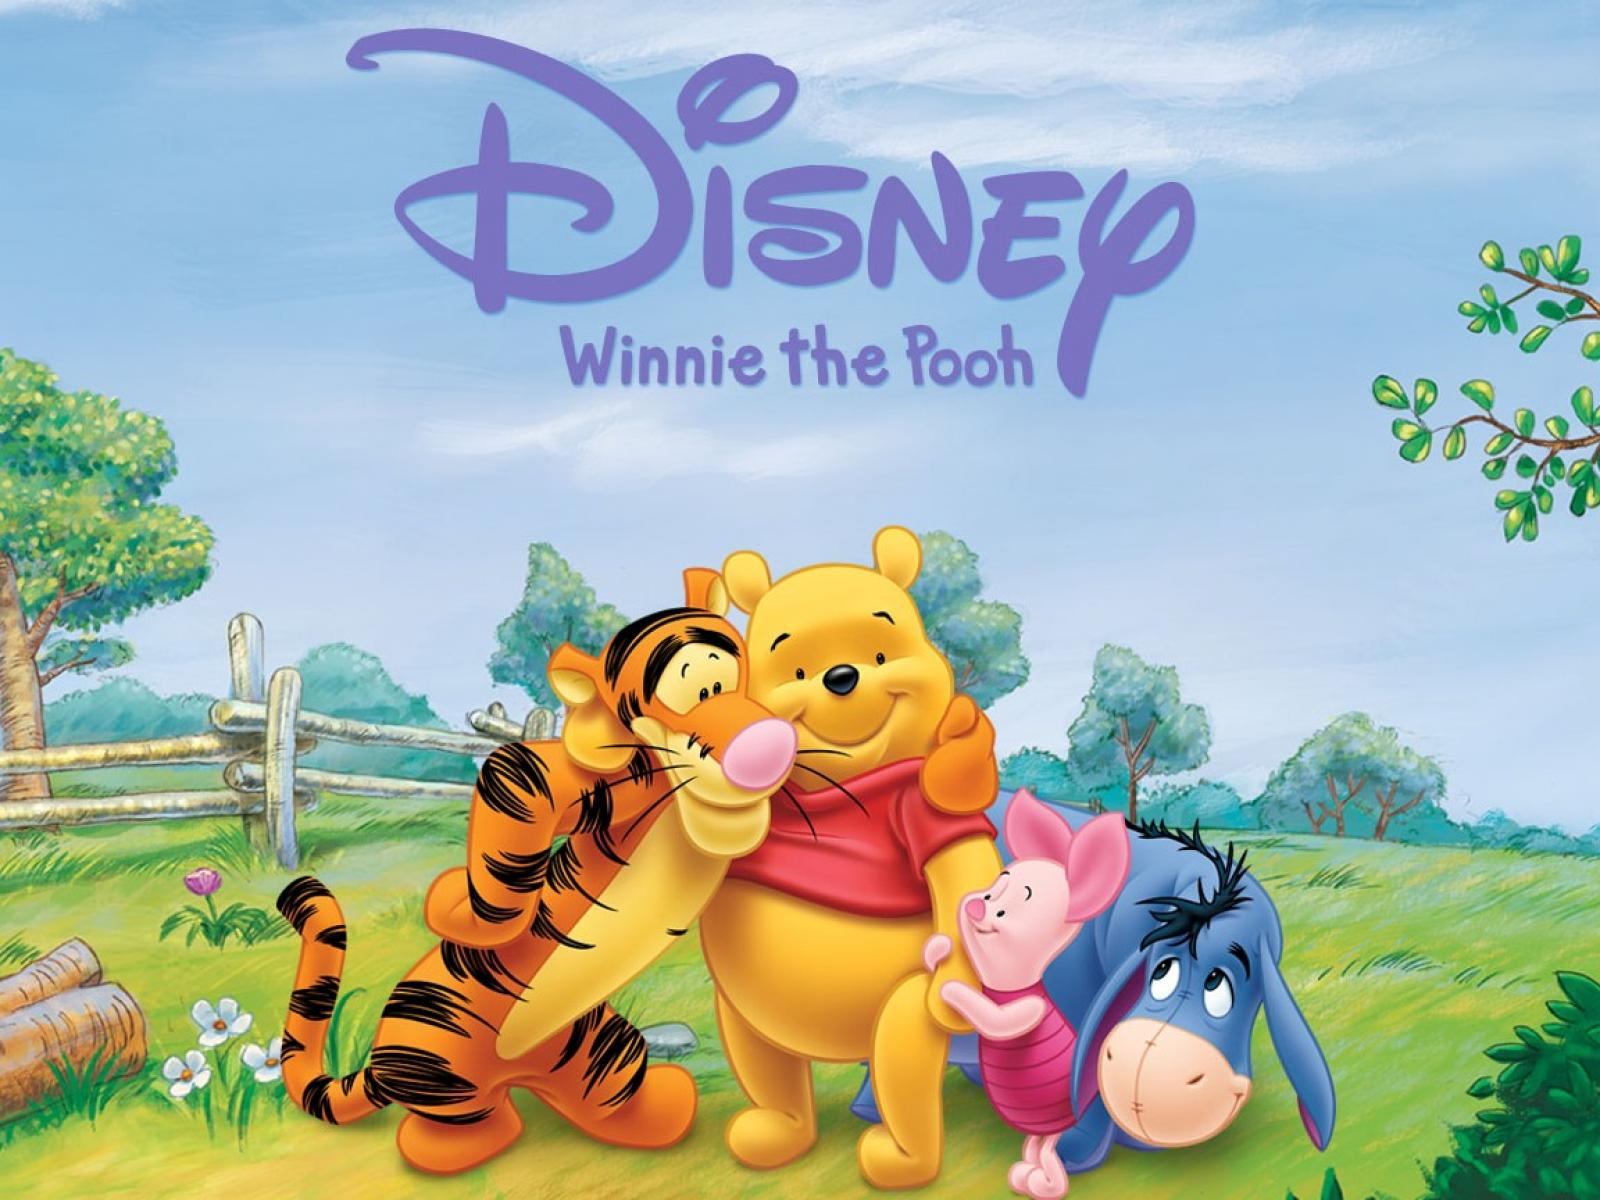 Disney Cartoon Wallpapers Top Free Disney Cartoon Backgrounds Wallpaperaccess